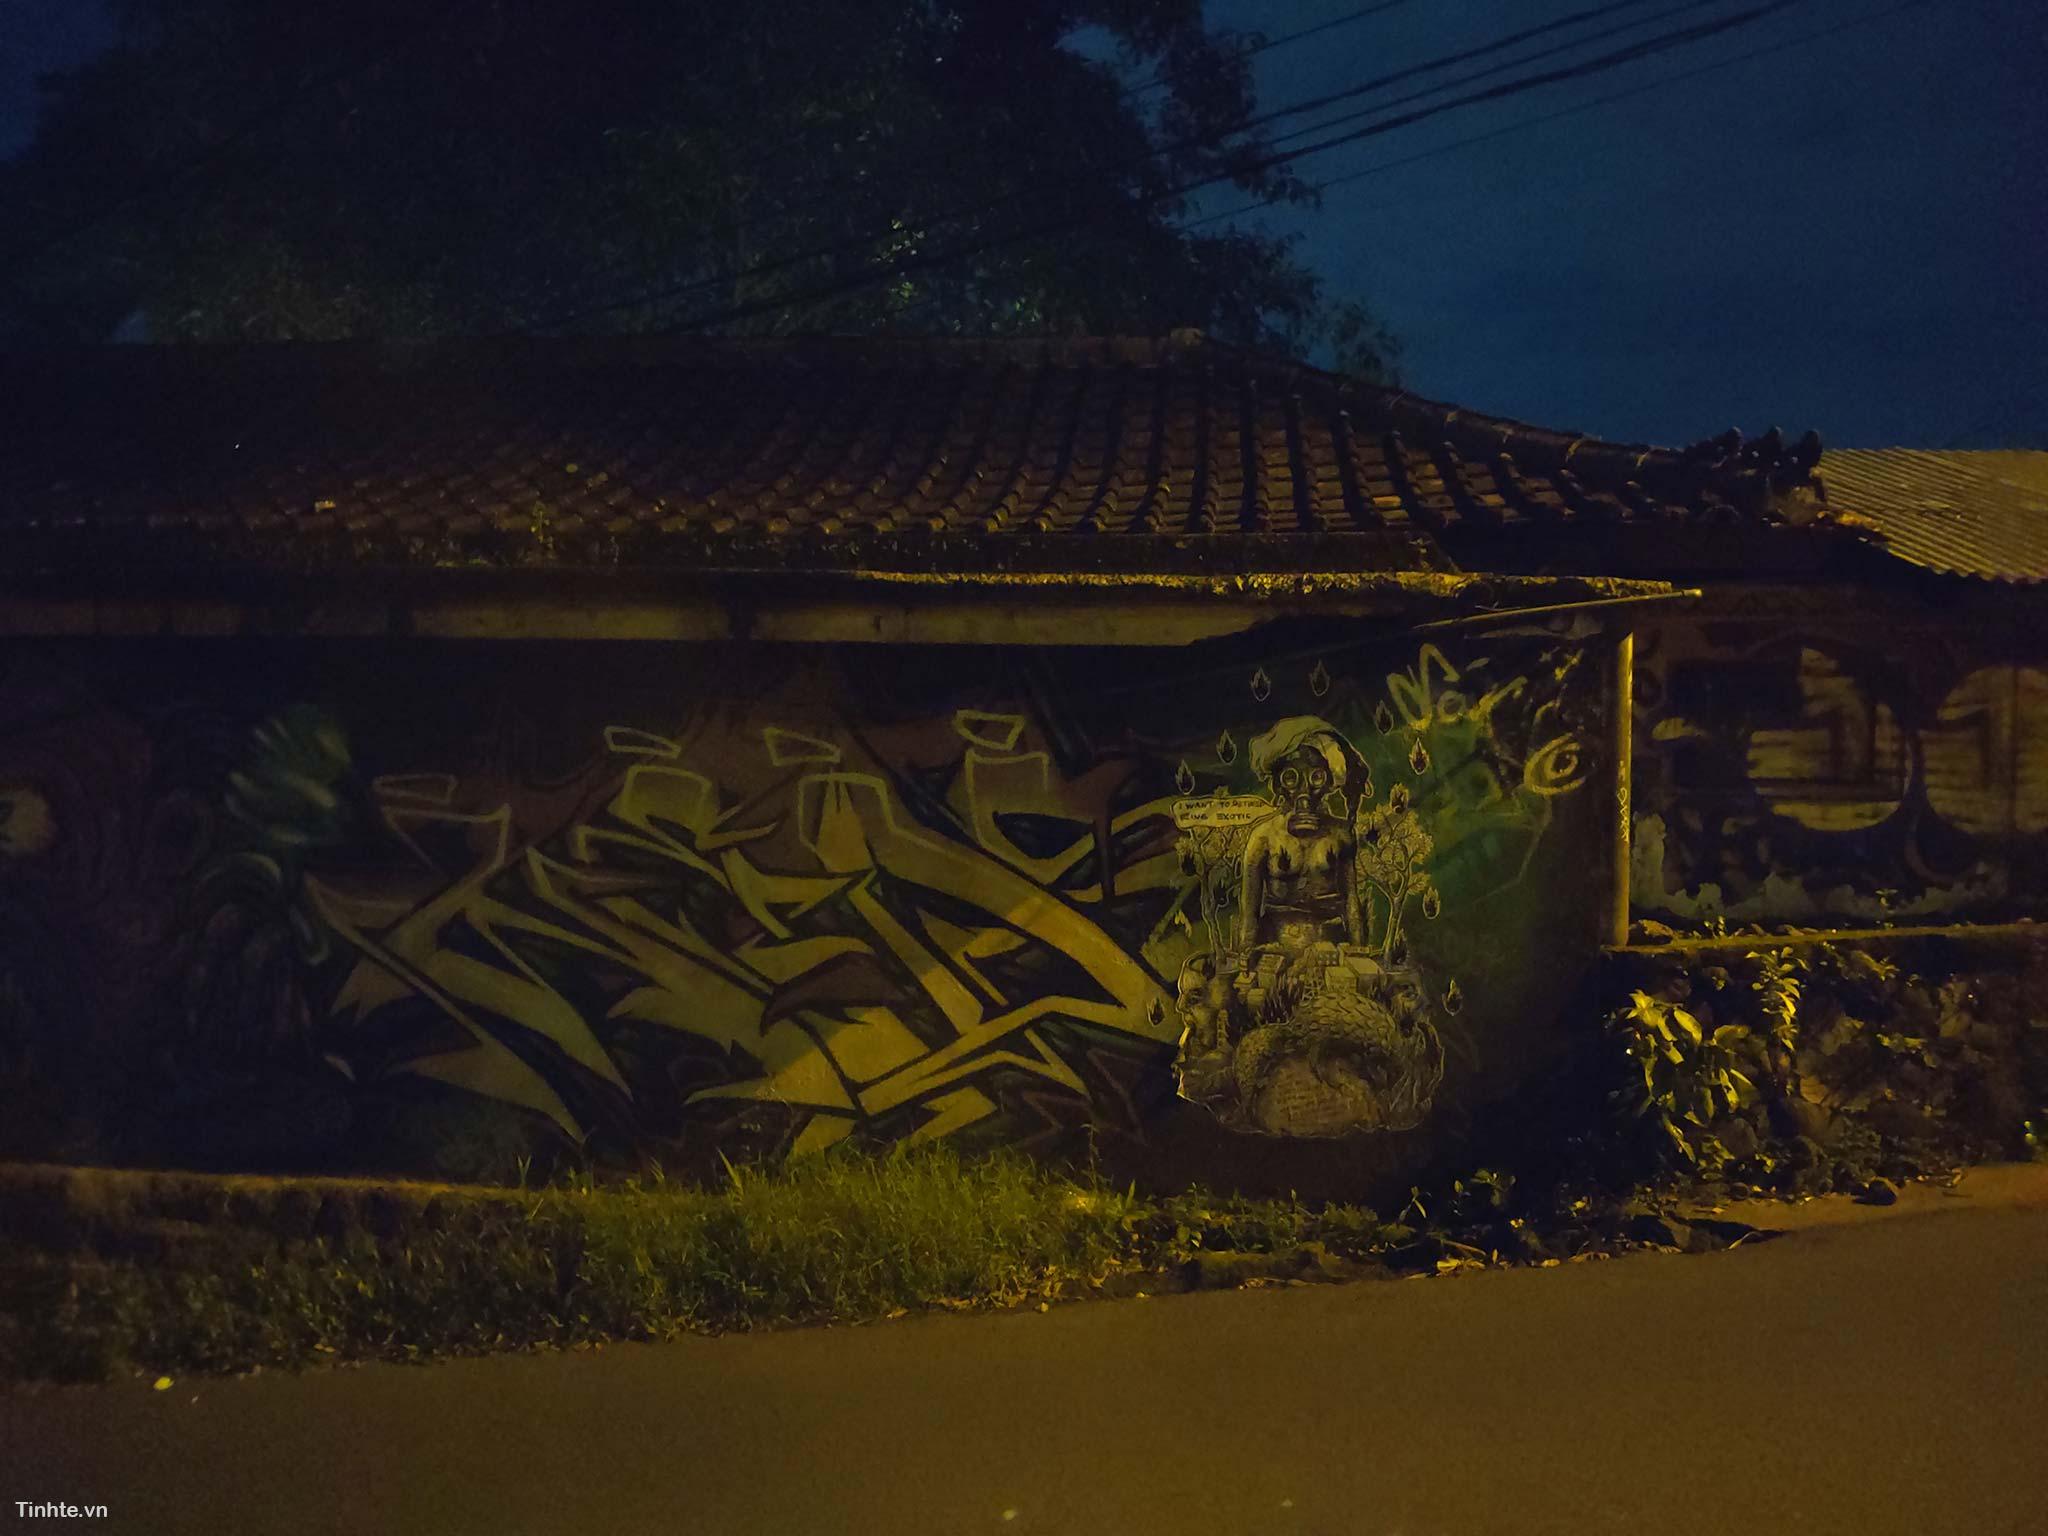 tinhte_chup_thu_camera_xiaomi_mi_mix_2s_bali_107.jpg